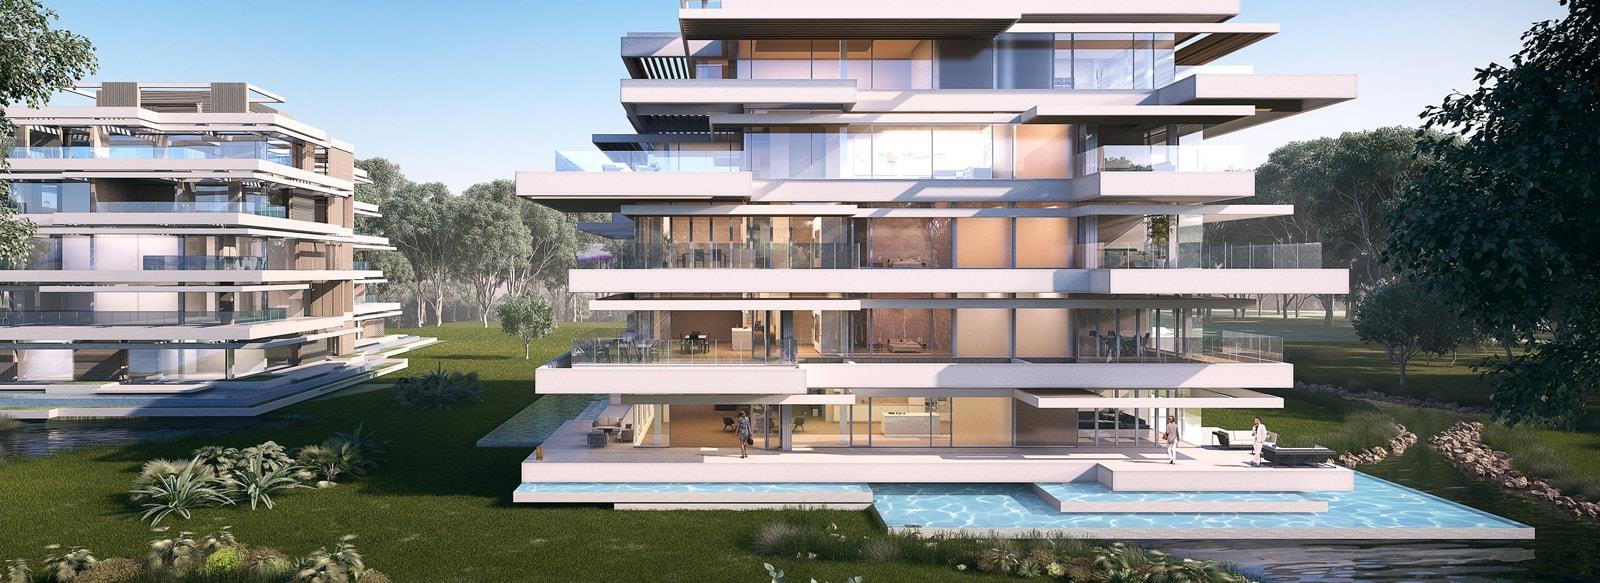 World Class Architecture